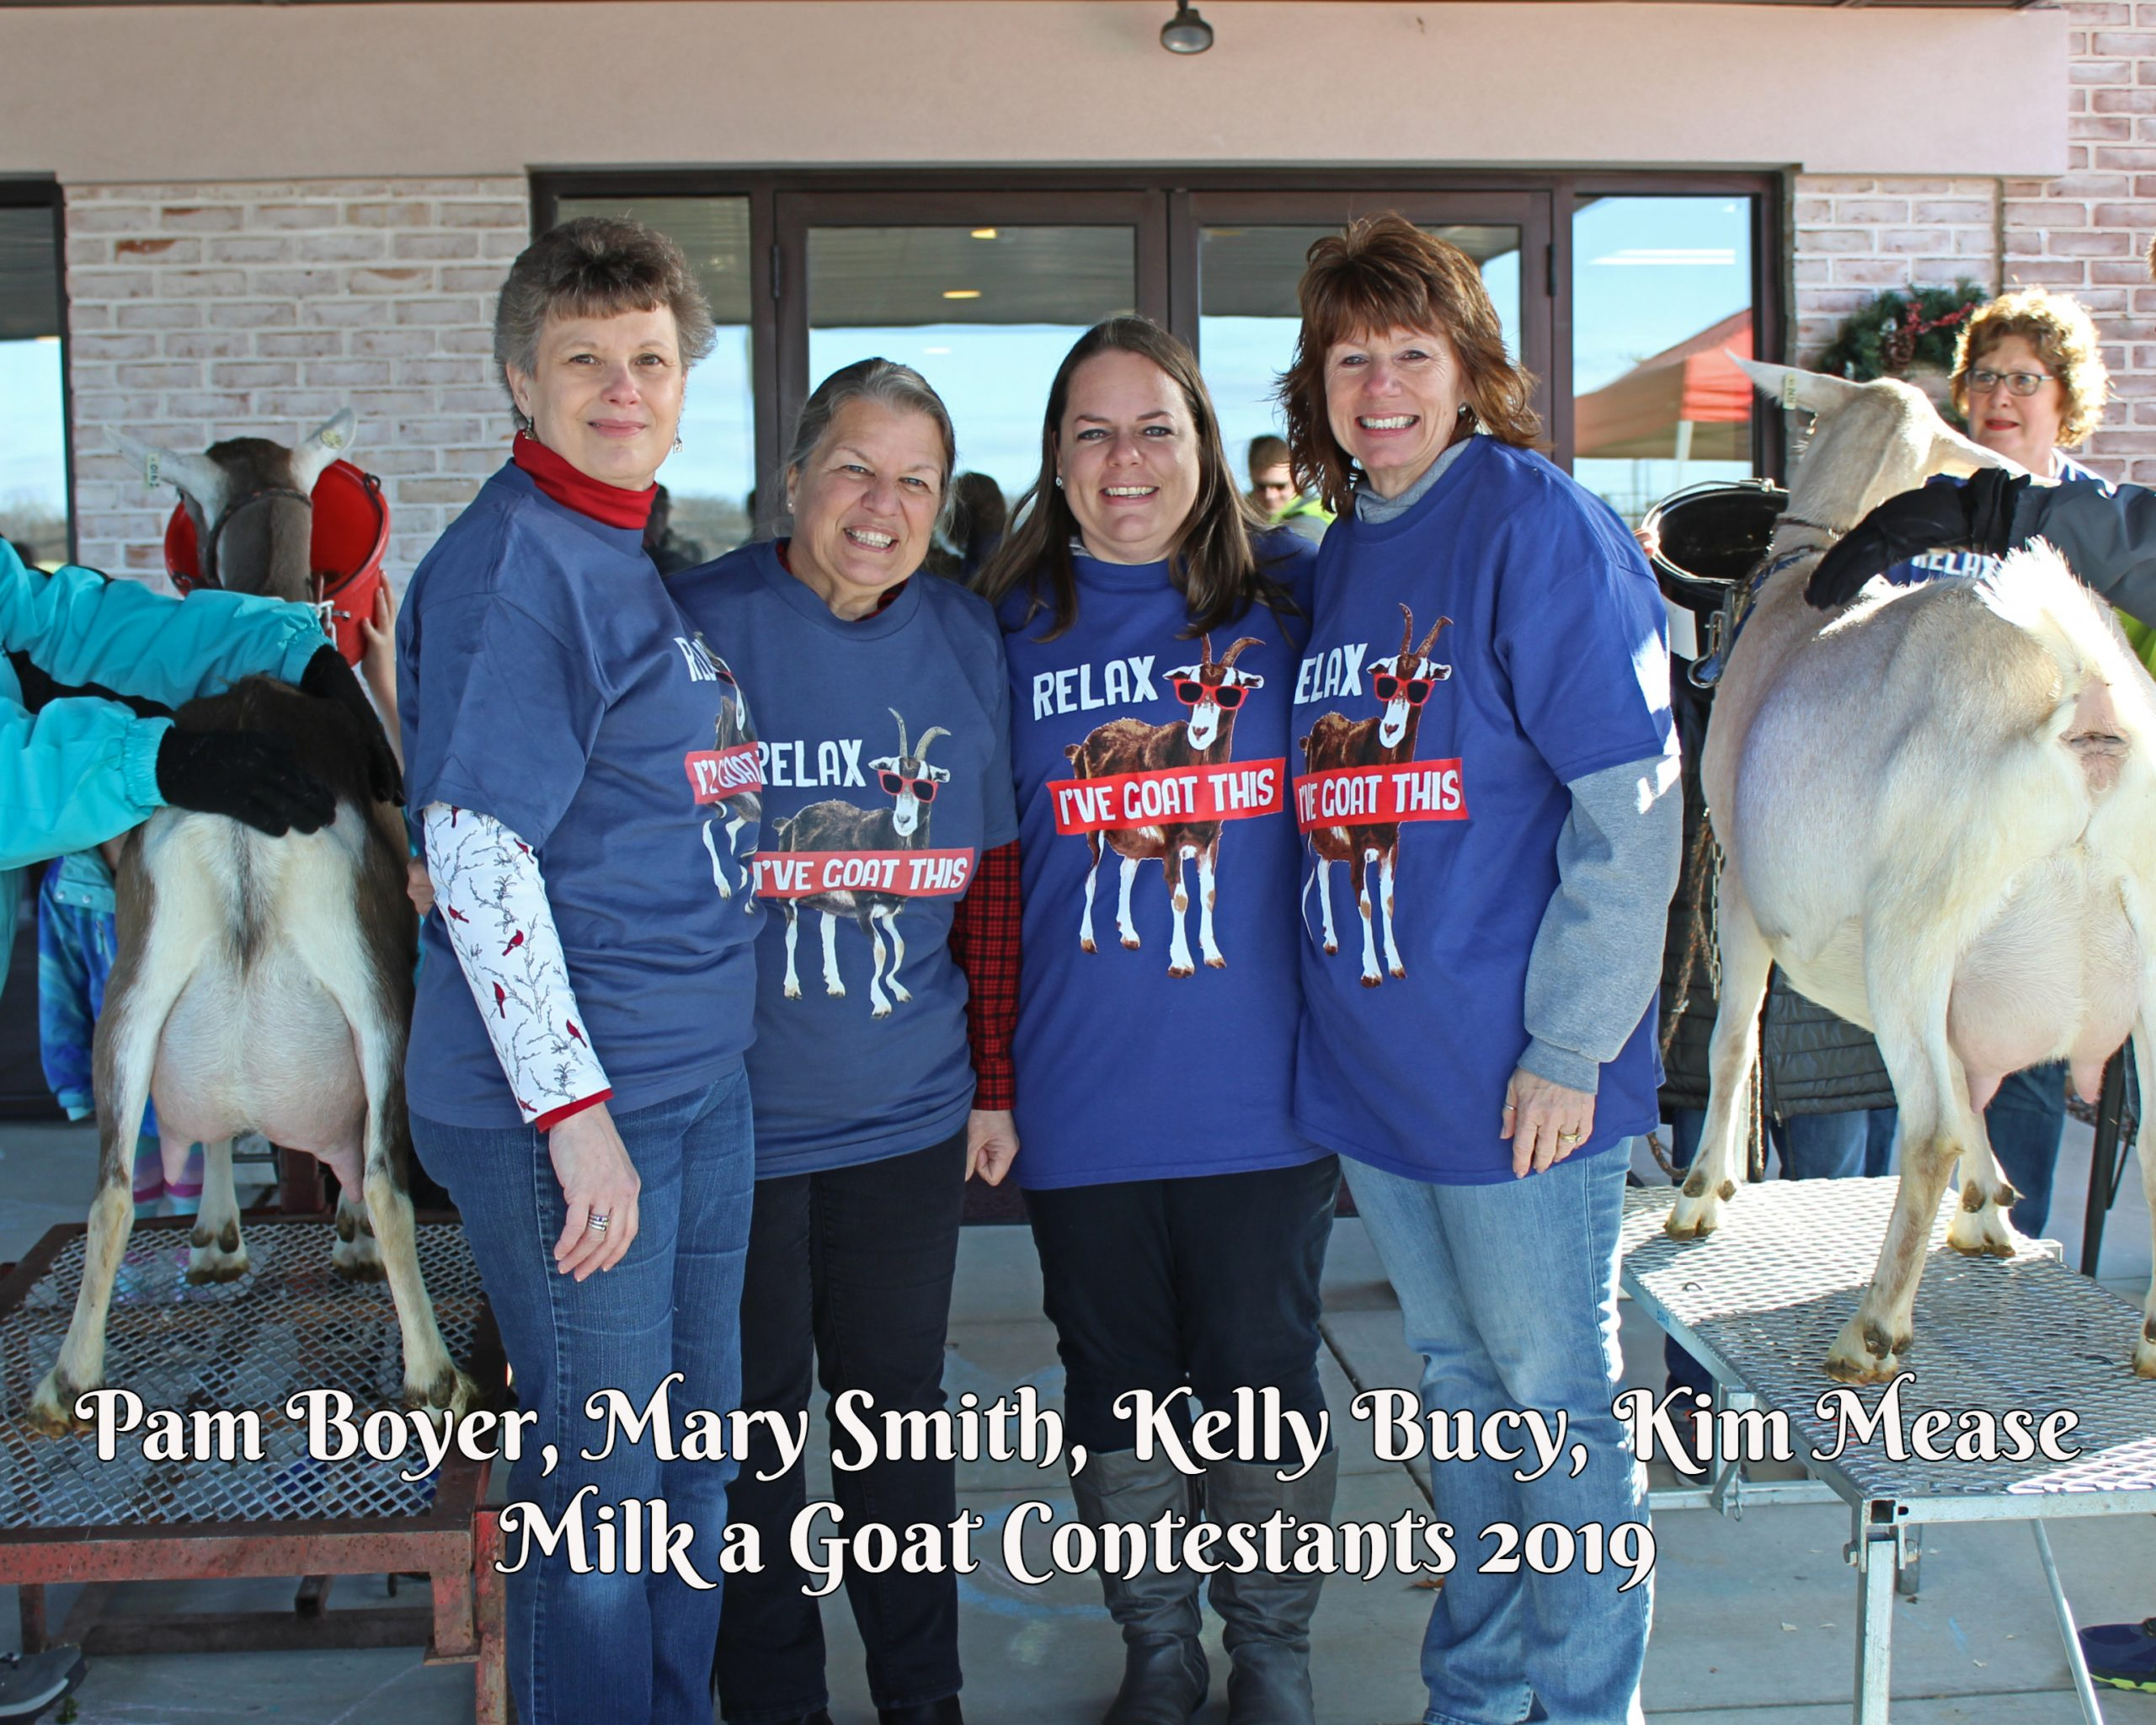 Milk-a-Goat-2019-scaled